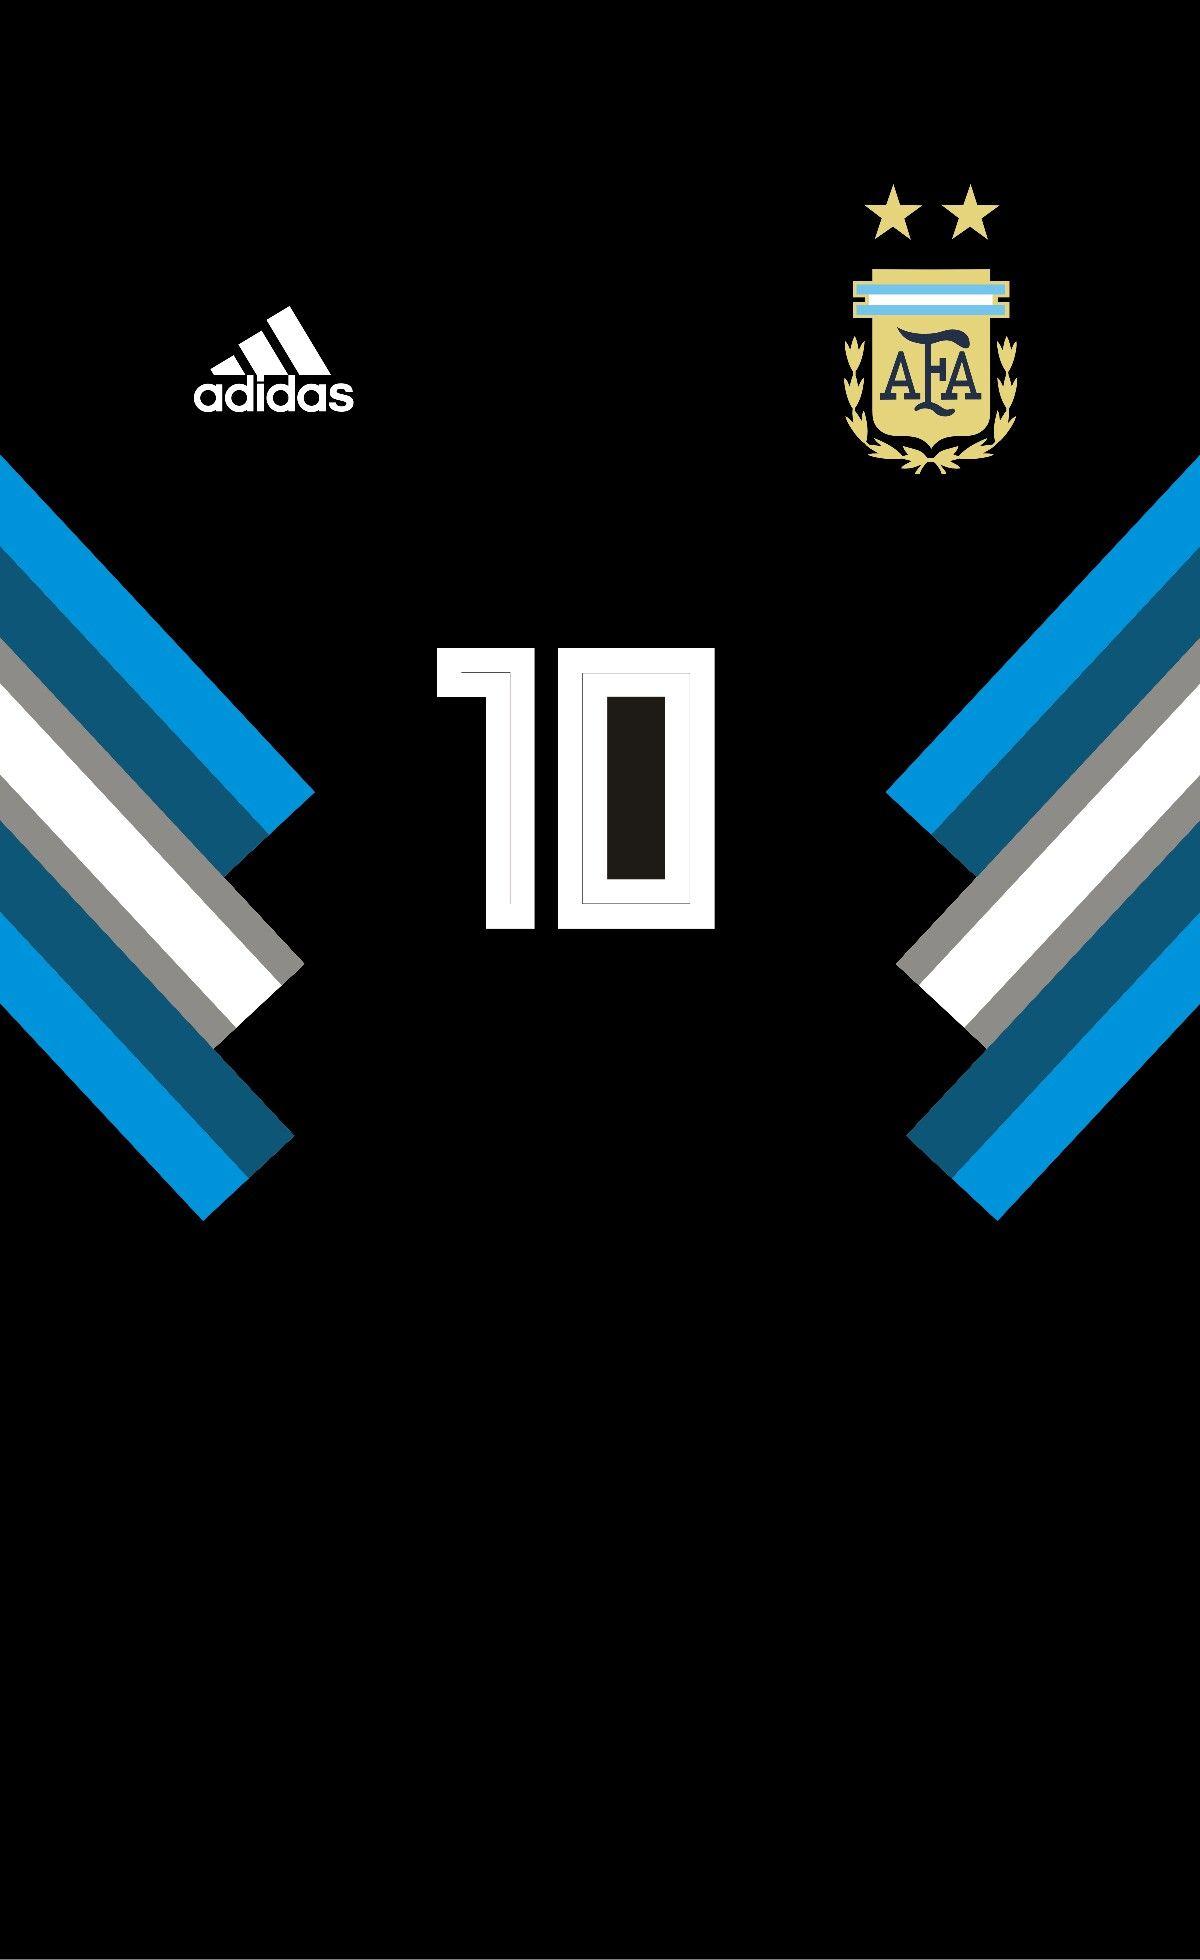 Pin De Mauro Toledo En Fondos De Camisetas Saf 2017 2018 Fondo De Pantalla Futbol Messi Fondos De Pantalla Camisetas De Equipo